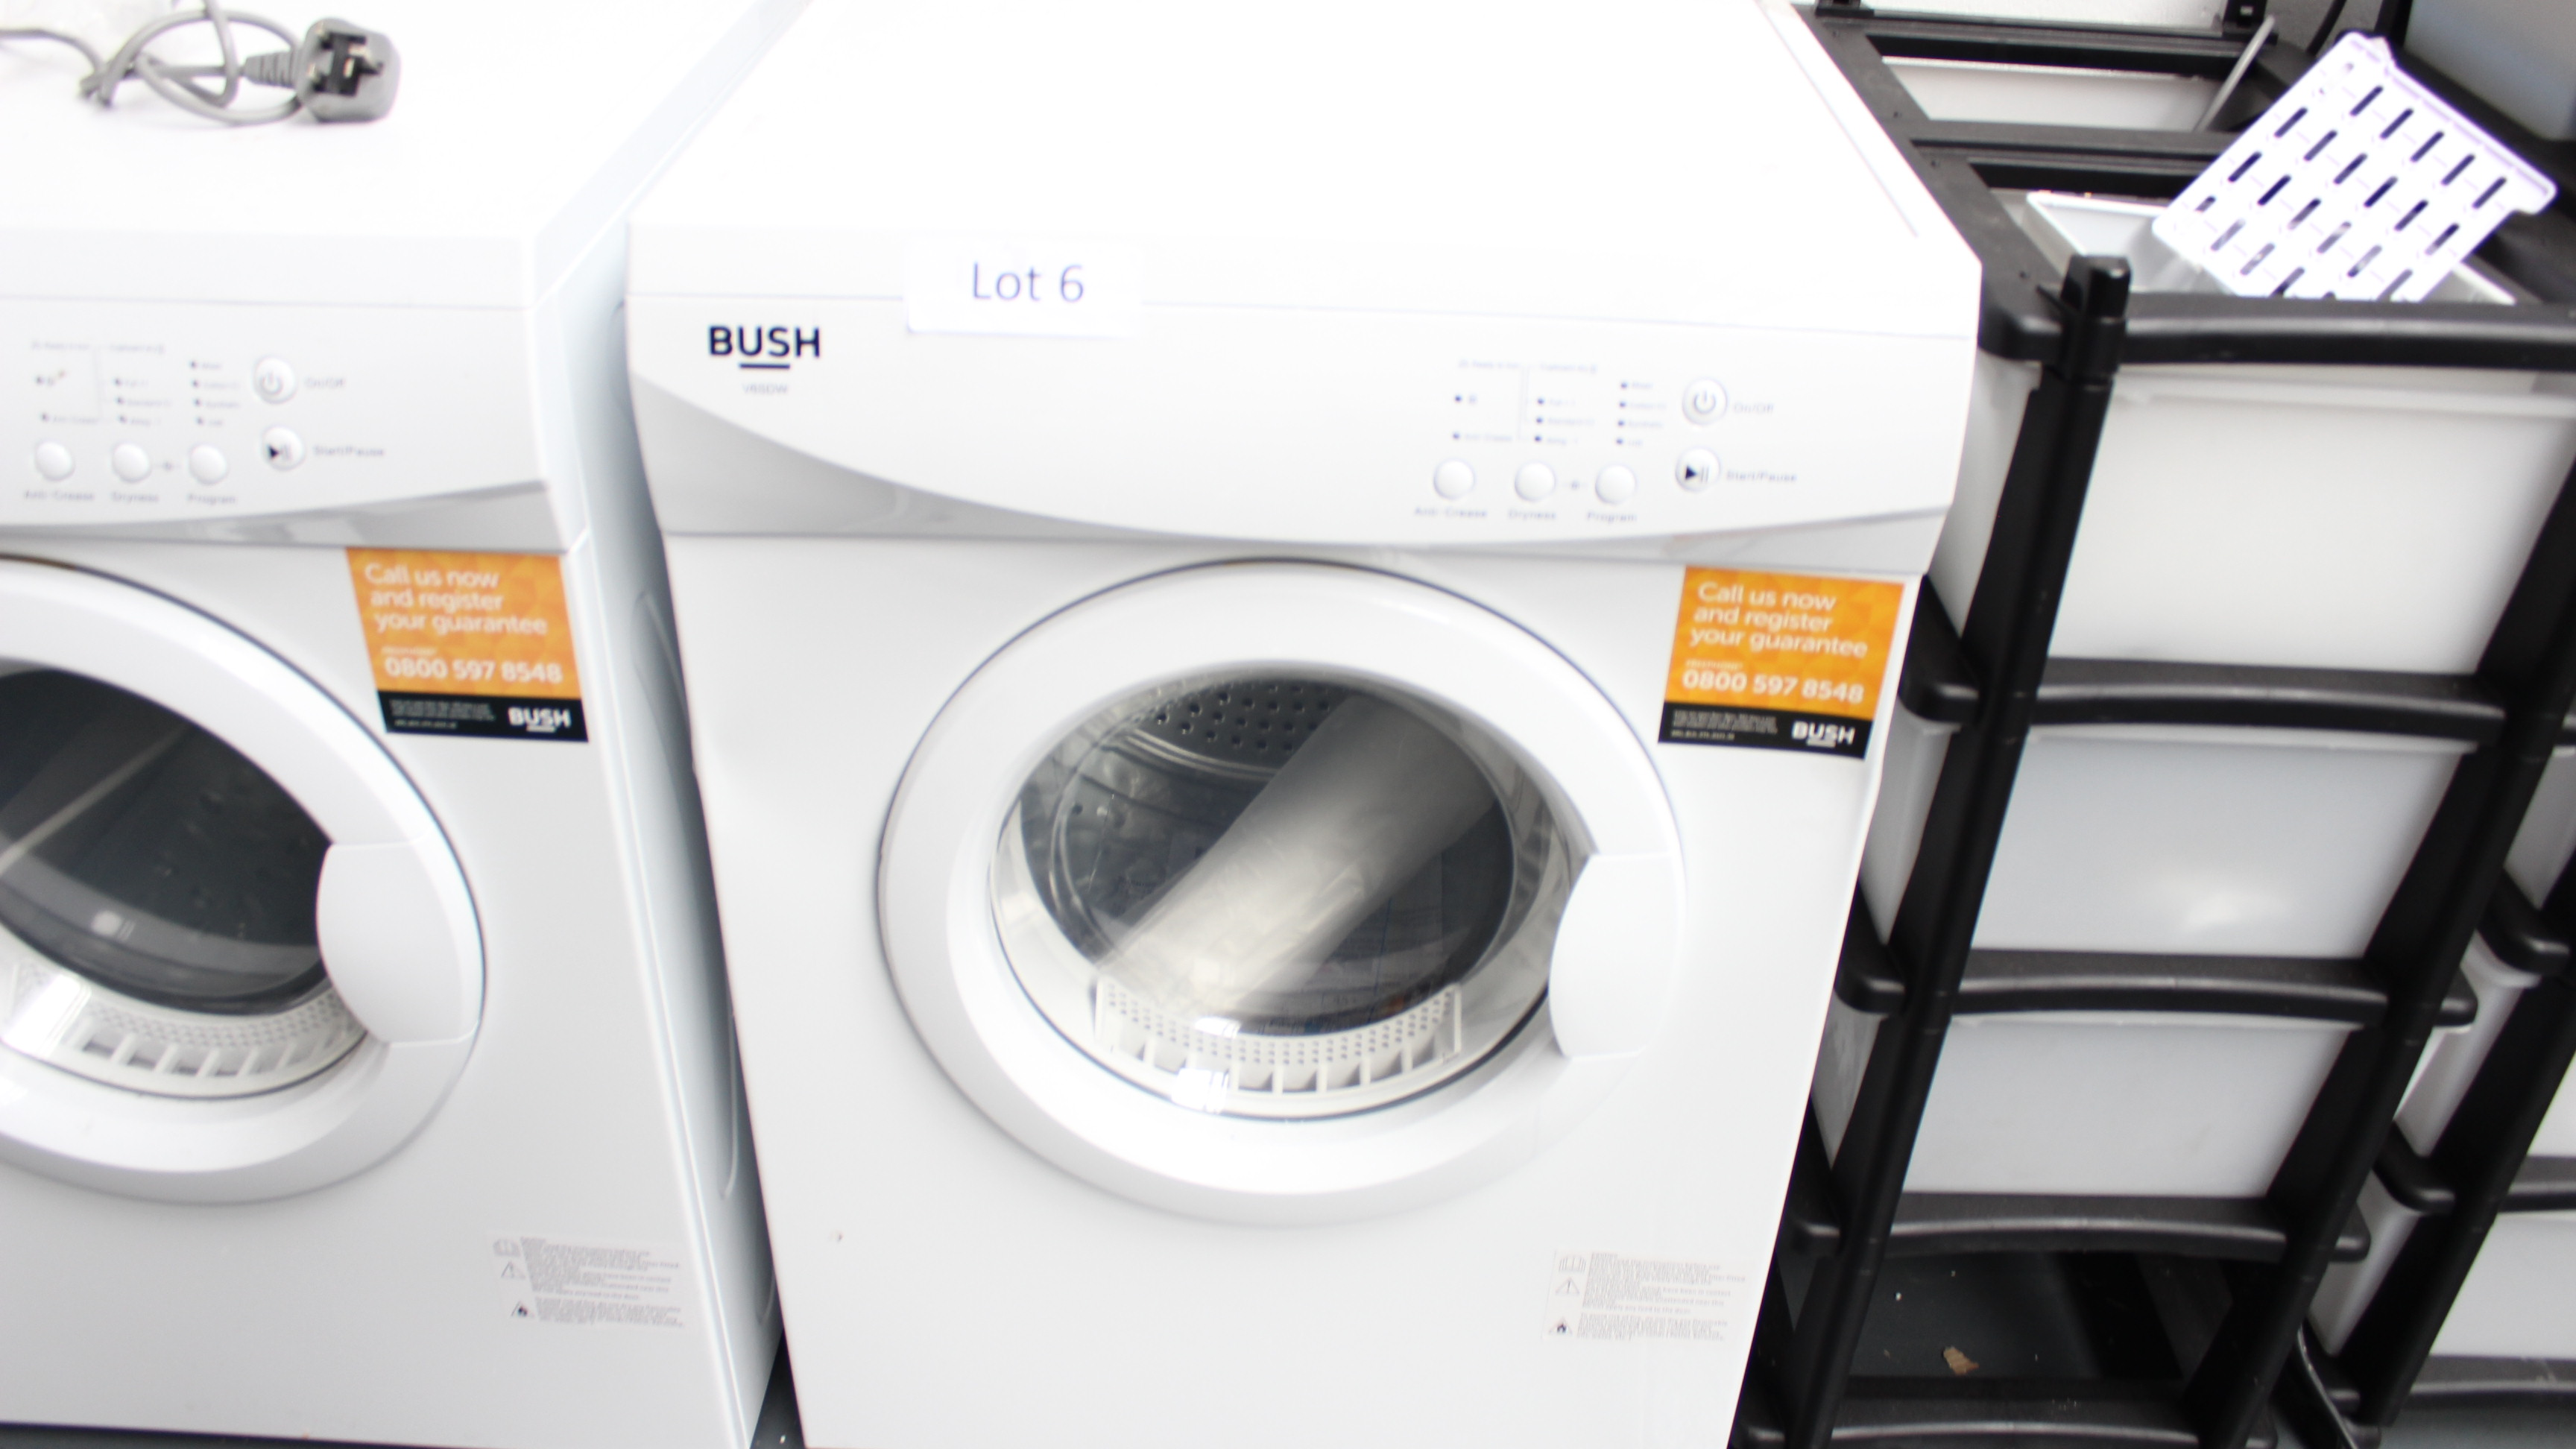 Lot 6 - Bush V6SDW Tumble Dryer Customer Returns